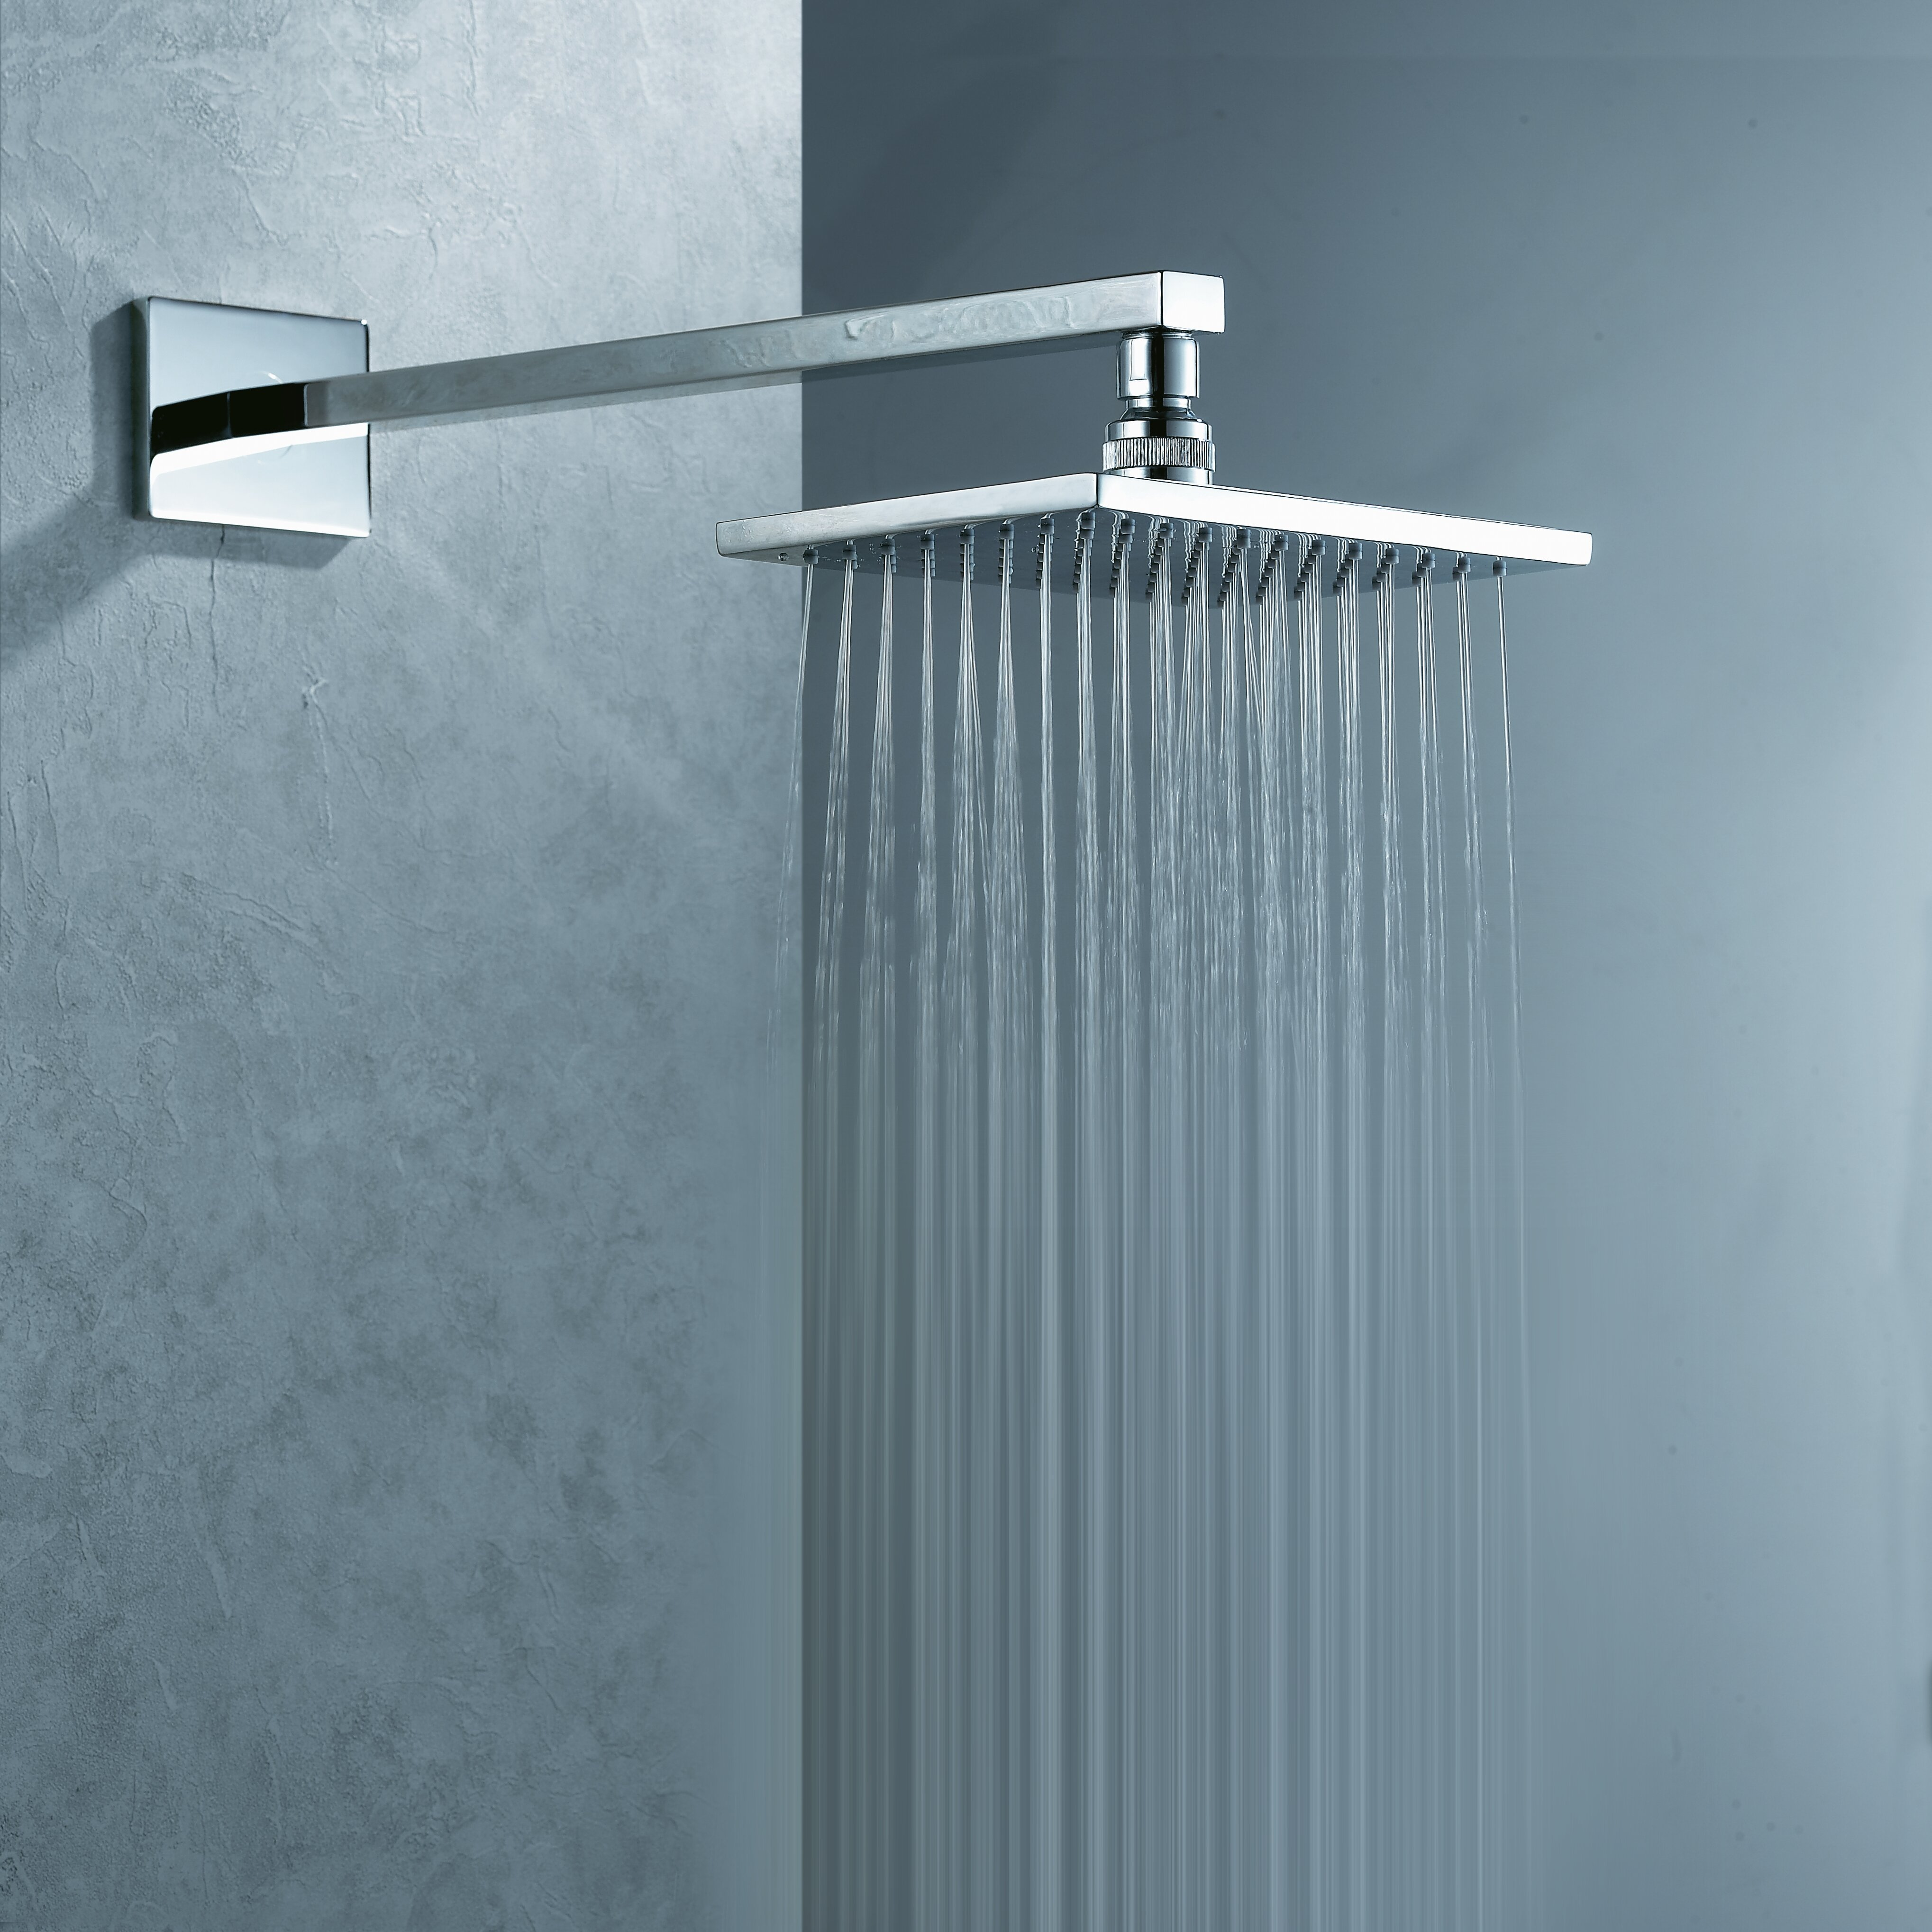 artos safire wall mount rain shower head reviews wayfair